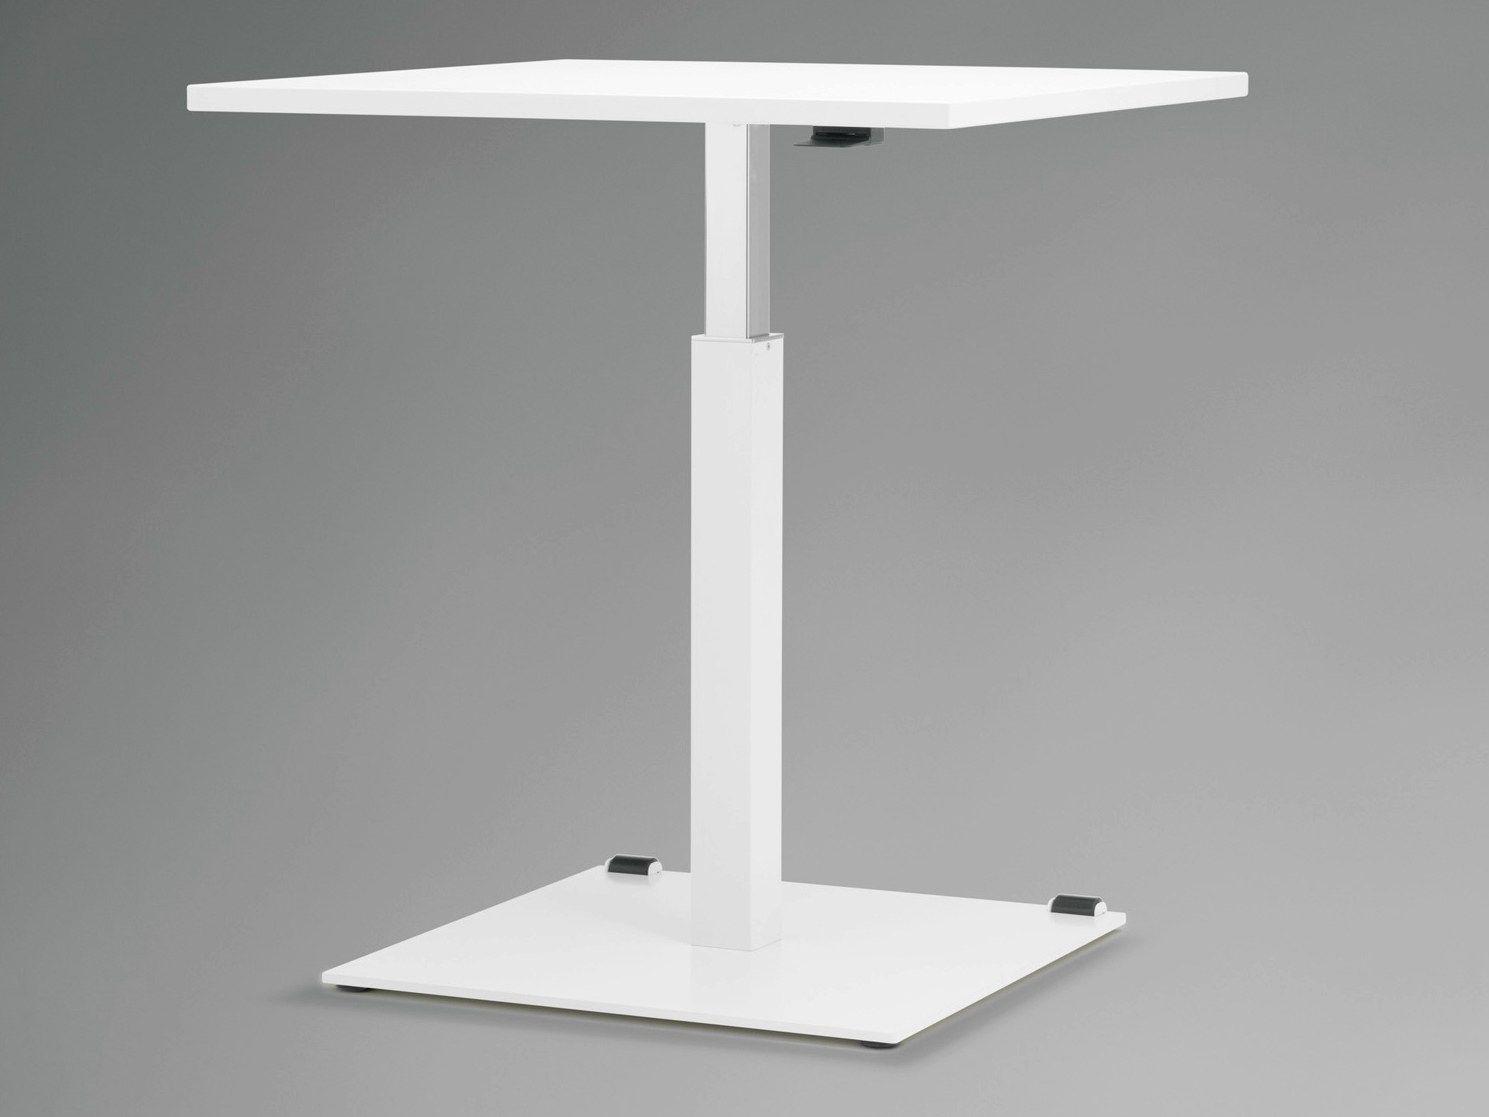 talo s h henverstellbarer tisch by k nig neurath. Black Bedroom Furniture Sets. Home Design Ideas